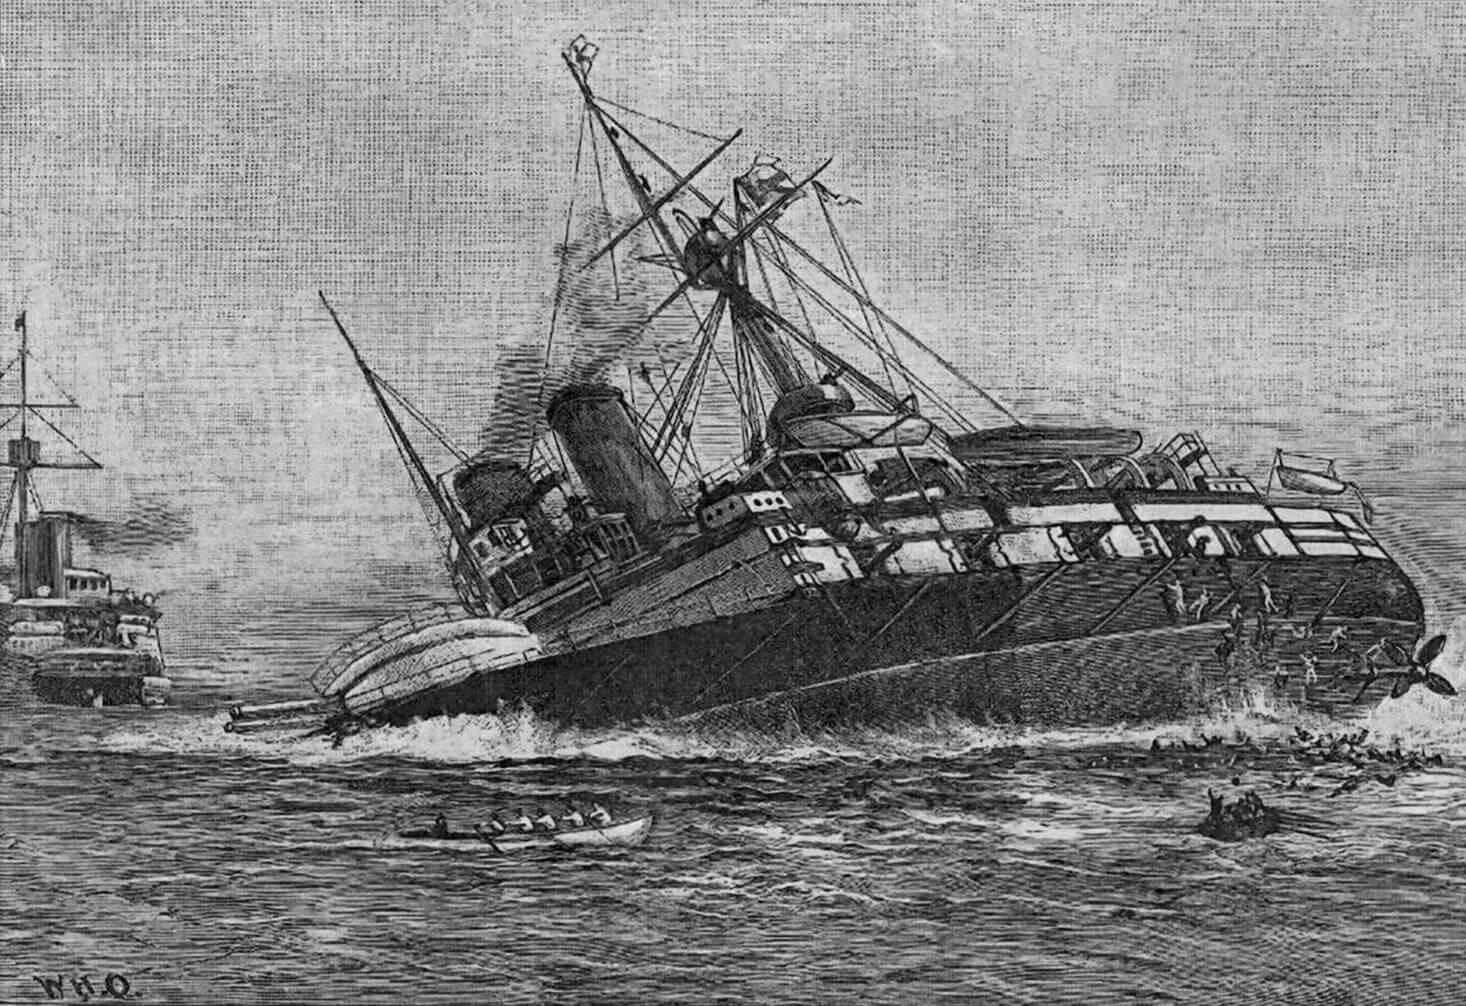 Гравюра с изображением момента гибели броненосца «Виктория»